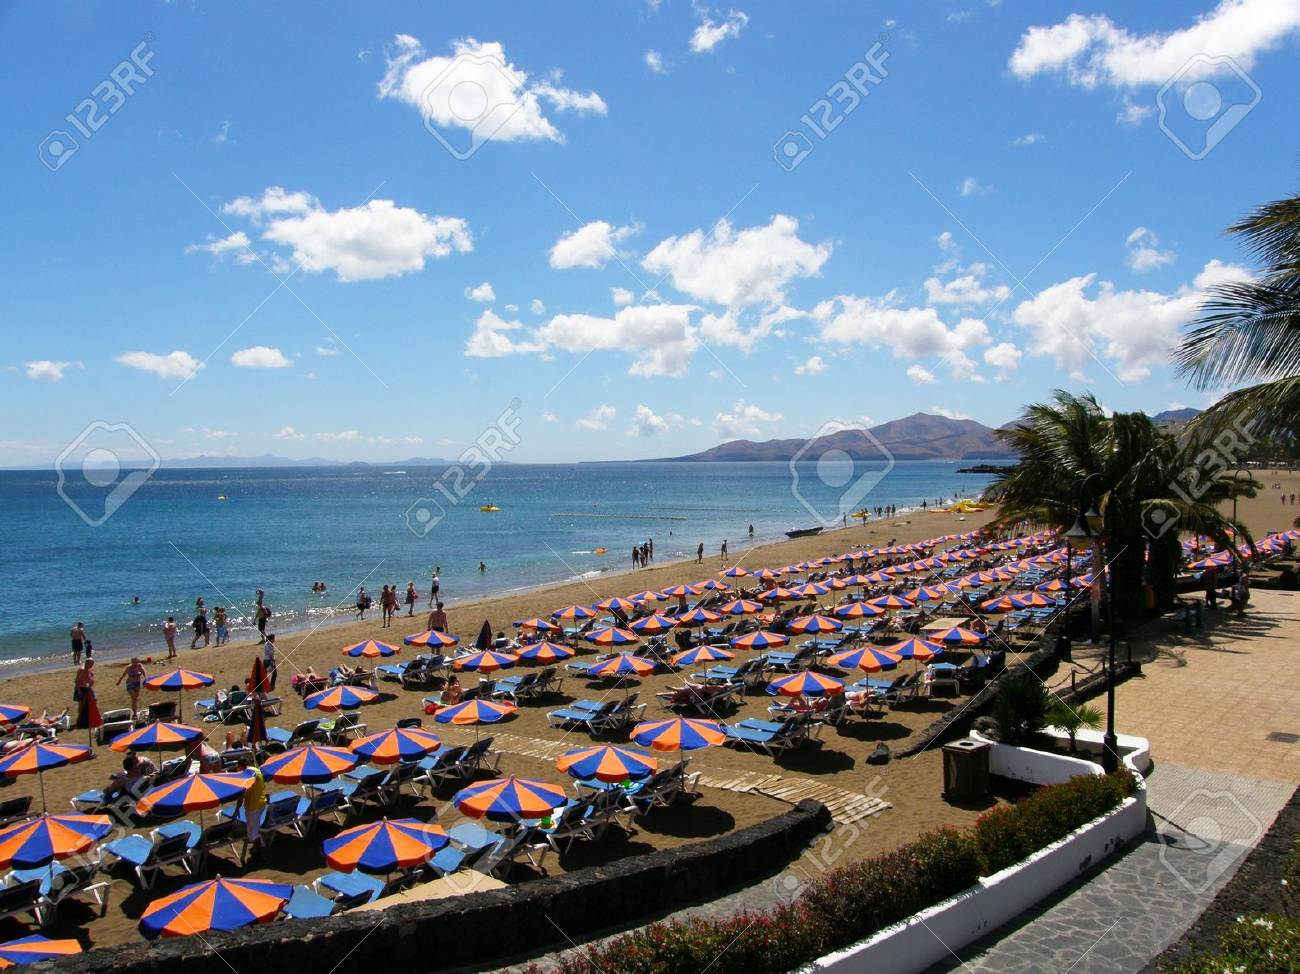 Puerto del Carmen Stock Photo - 10326565